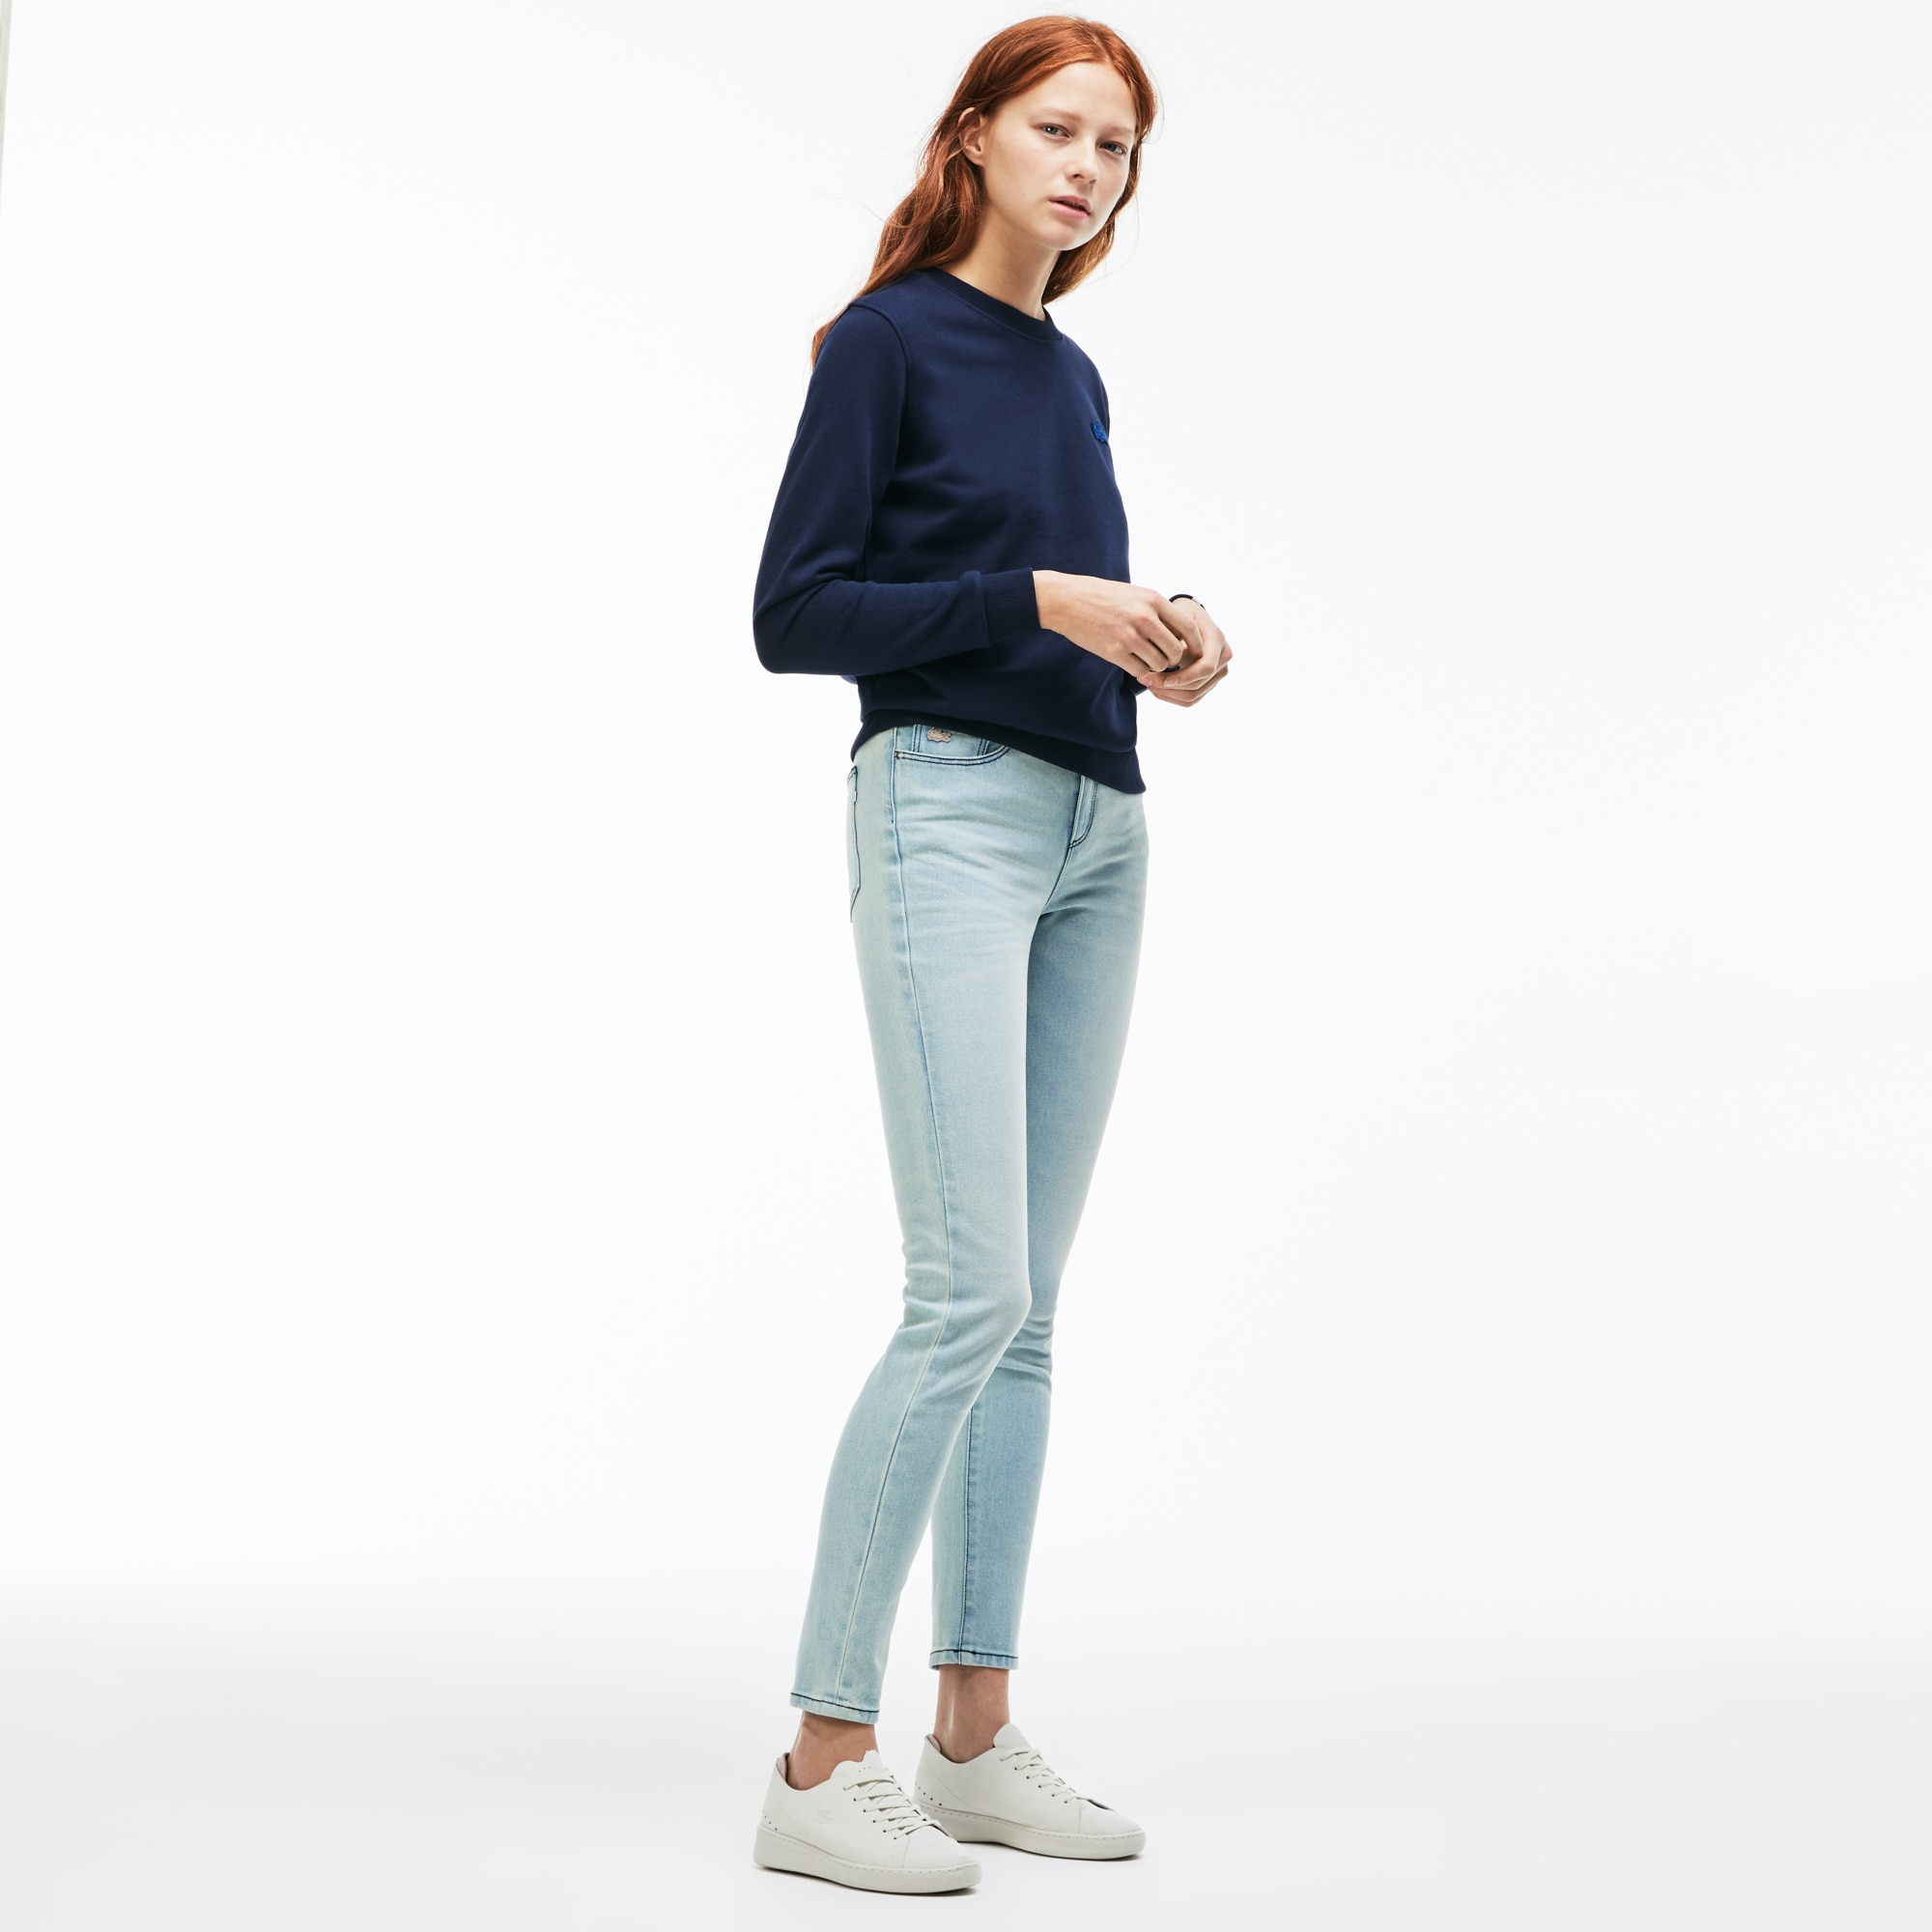 Lacoste LIVE-jeans dames stretch-katoendenim met 5 zakken